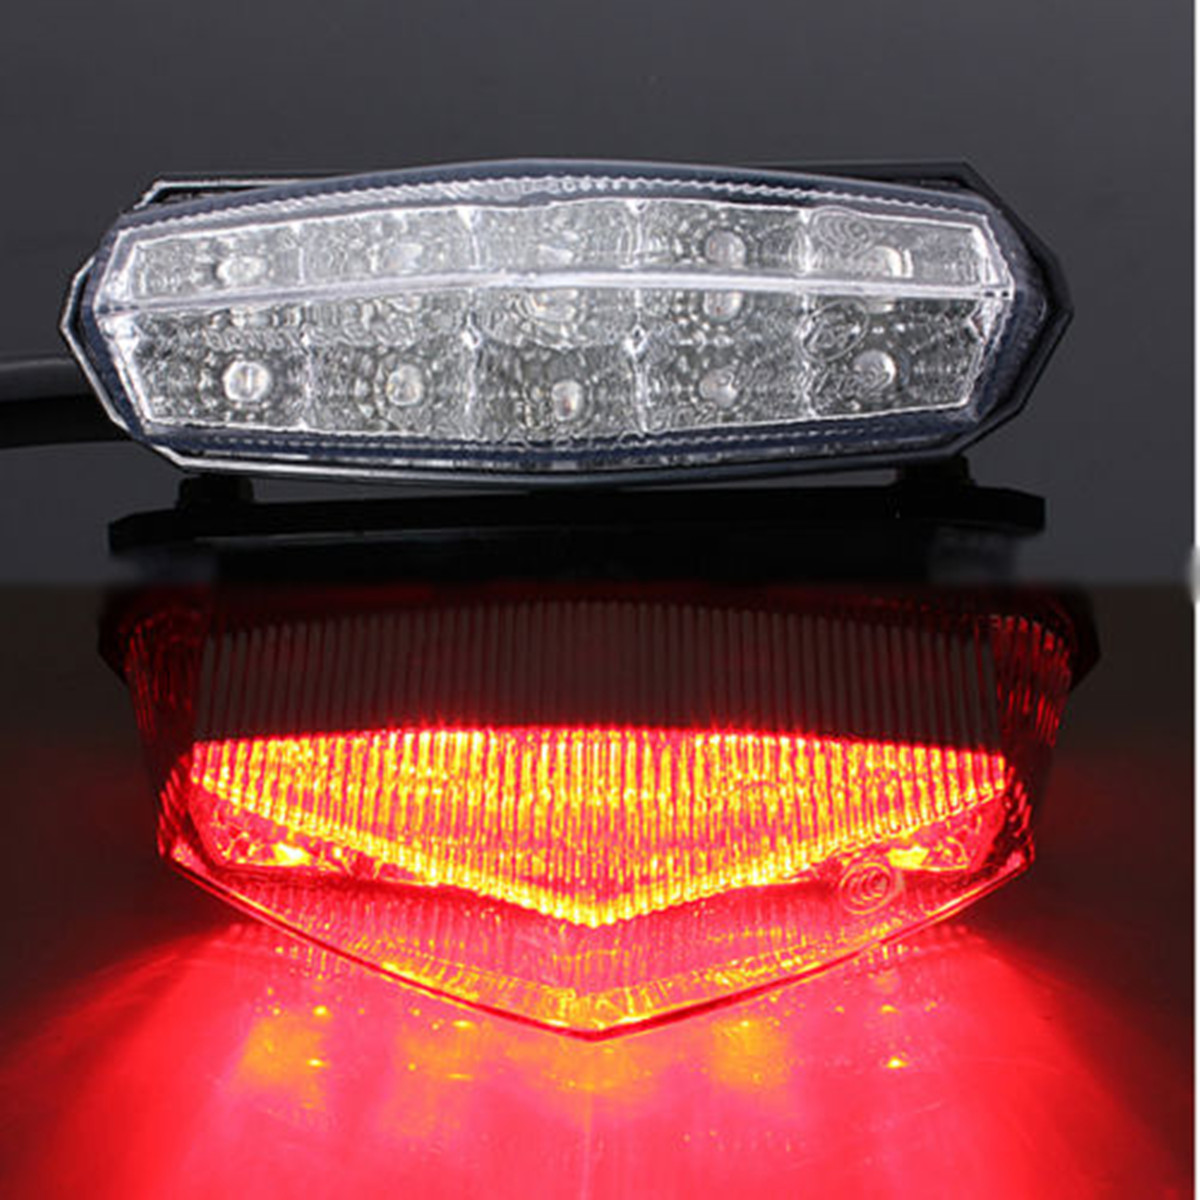 Motorcycle Motorbike ATV Quad LED License Plate Rear Tail Stop Brake Indicator Light Lamp